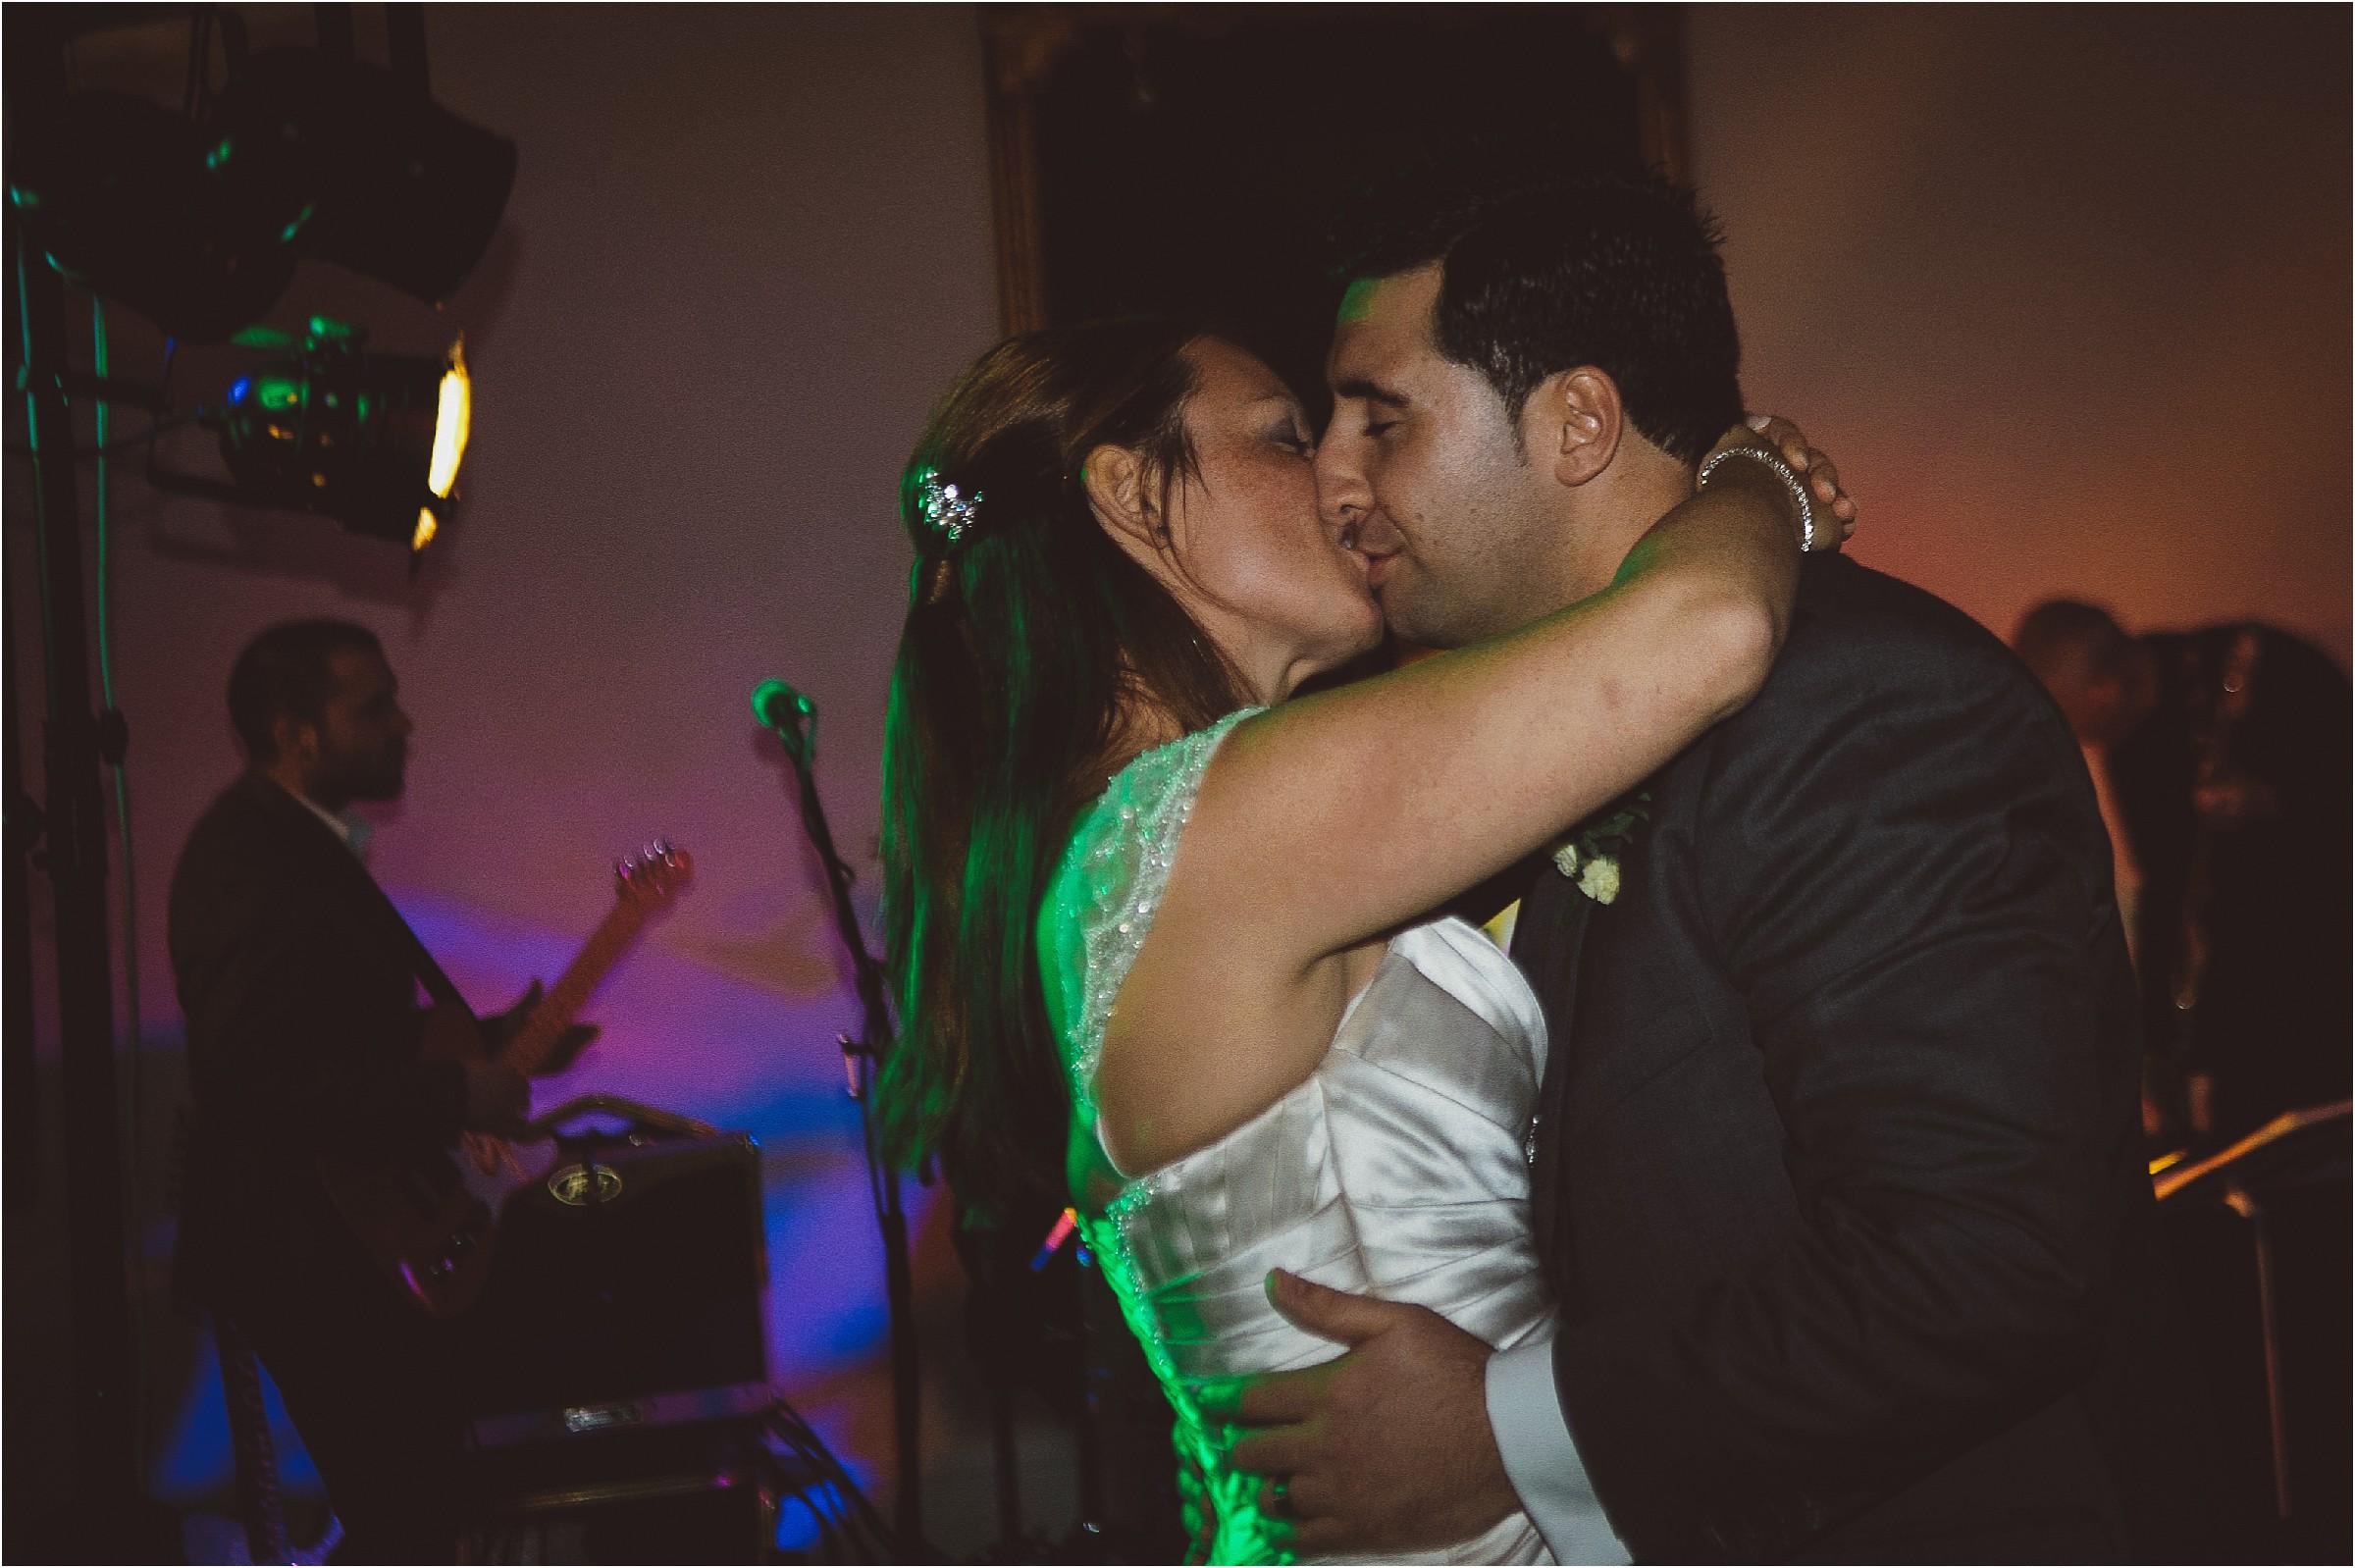 051 wedding photography doxford hall northumberlandDSC_1212e